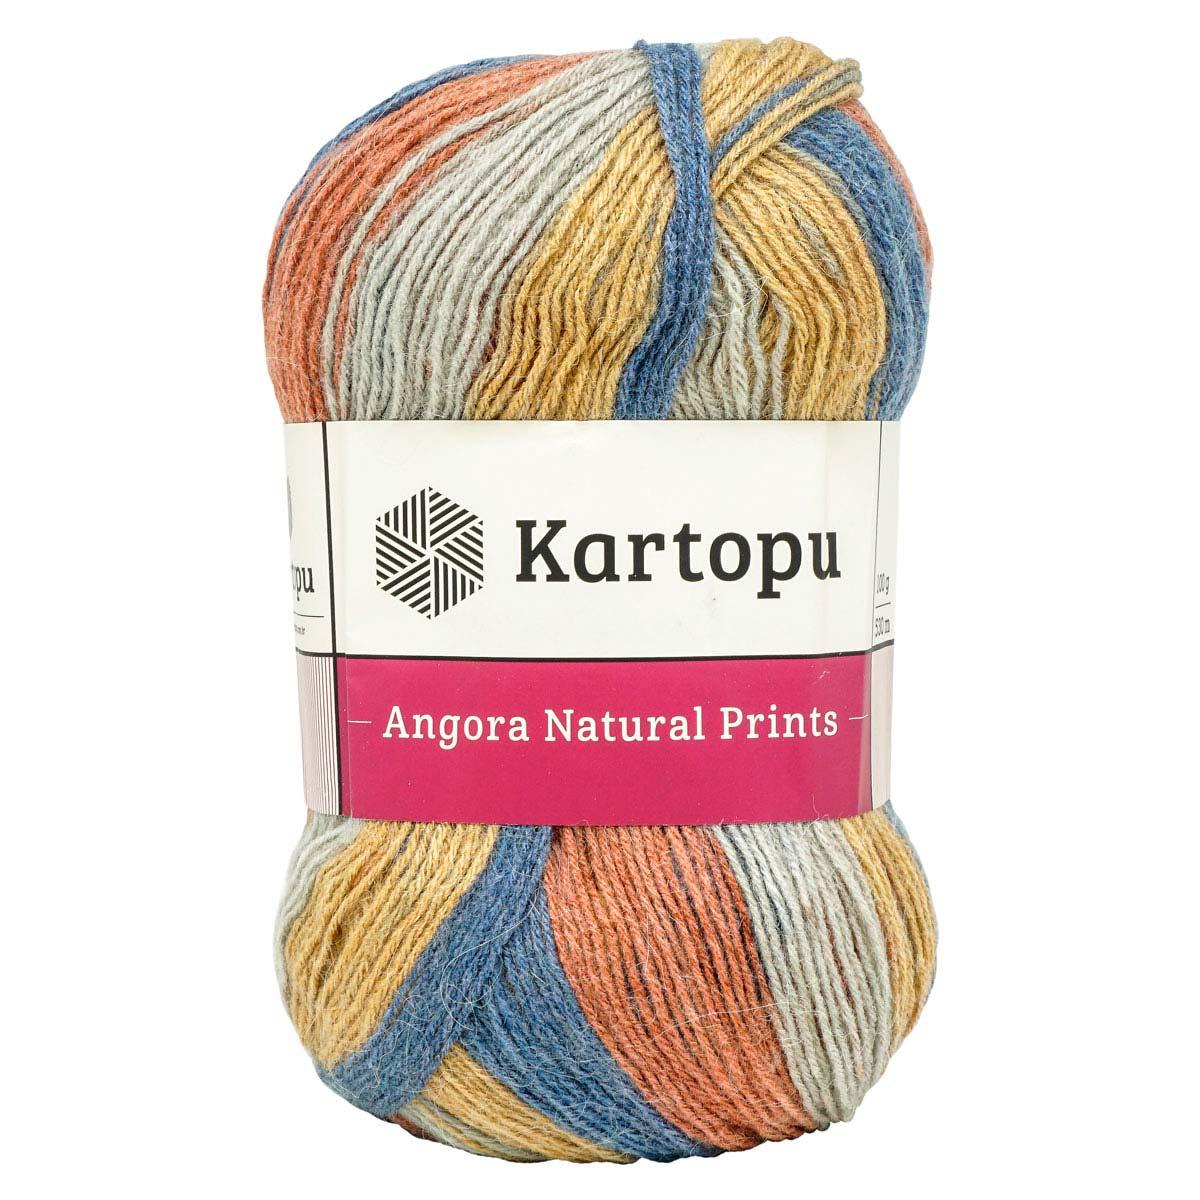 Пряжа KARTOPU 'ANGORA NATURAL PRINTS' 100г 530м (10% шерсть, 10% мохер, 80% акрил)